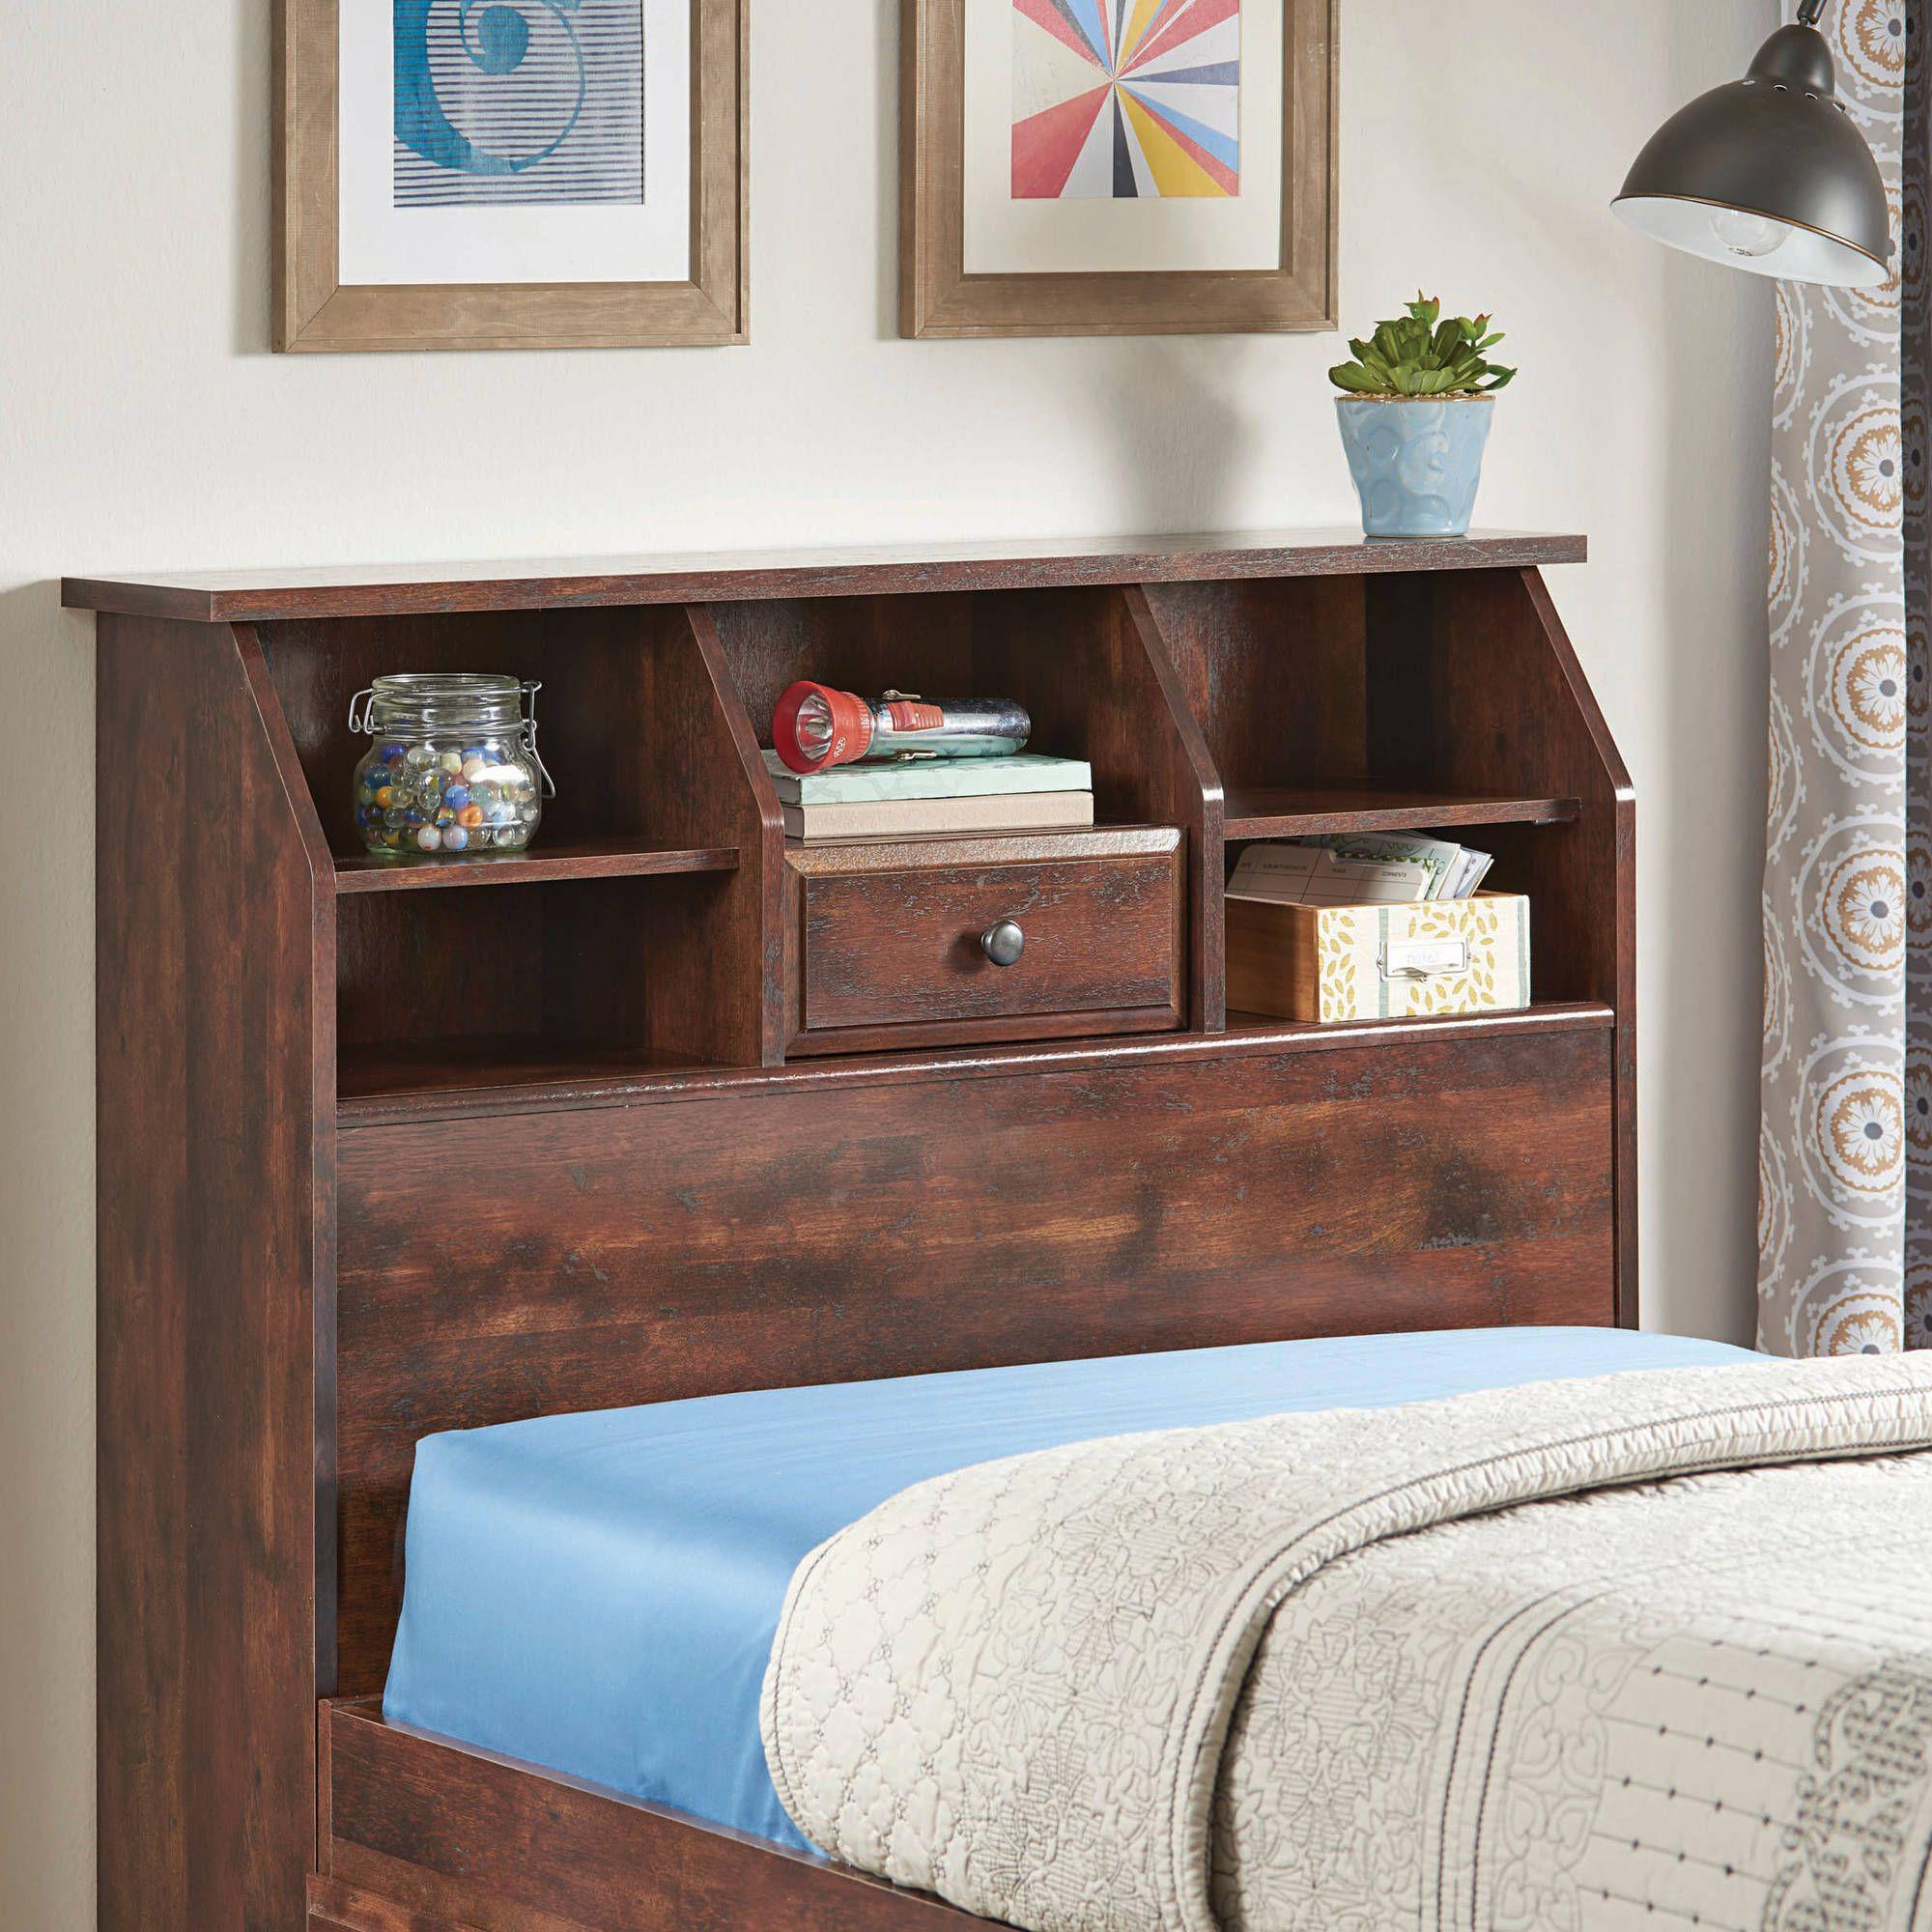 Better homes gardens leighton twin bookcase headboard